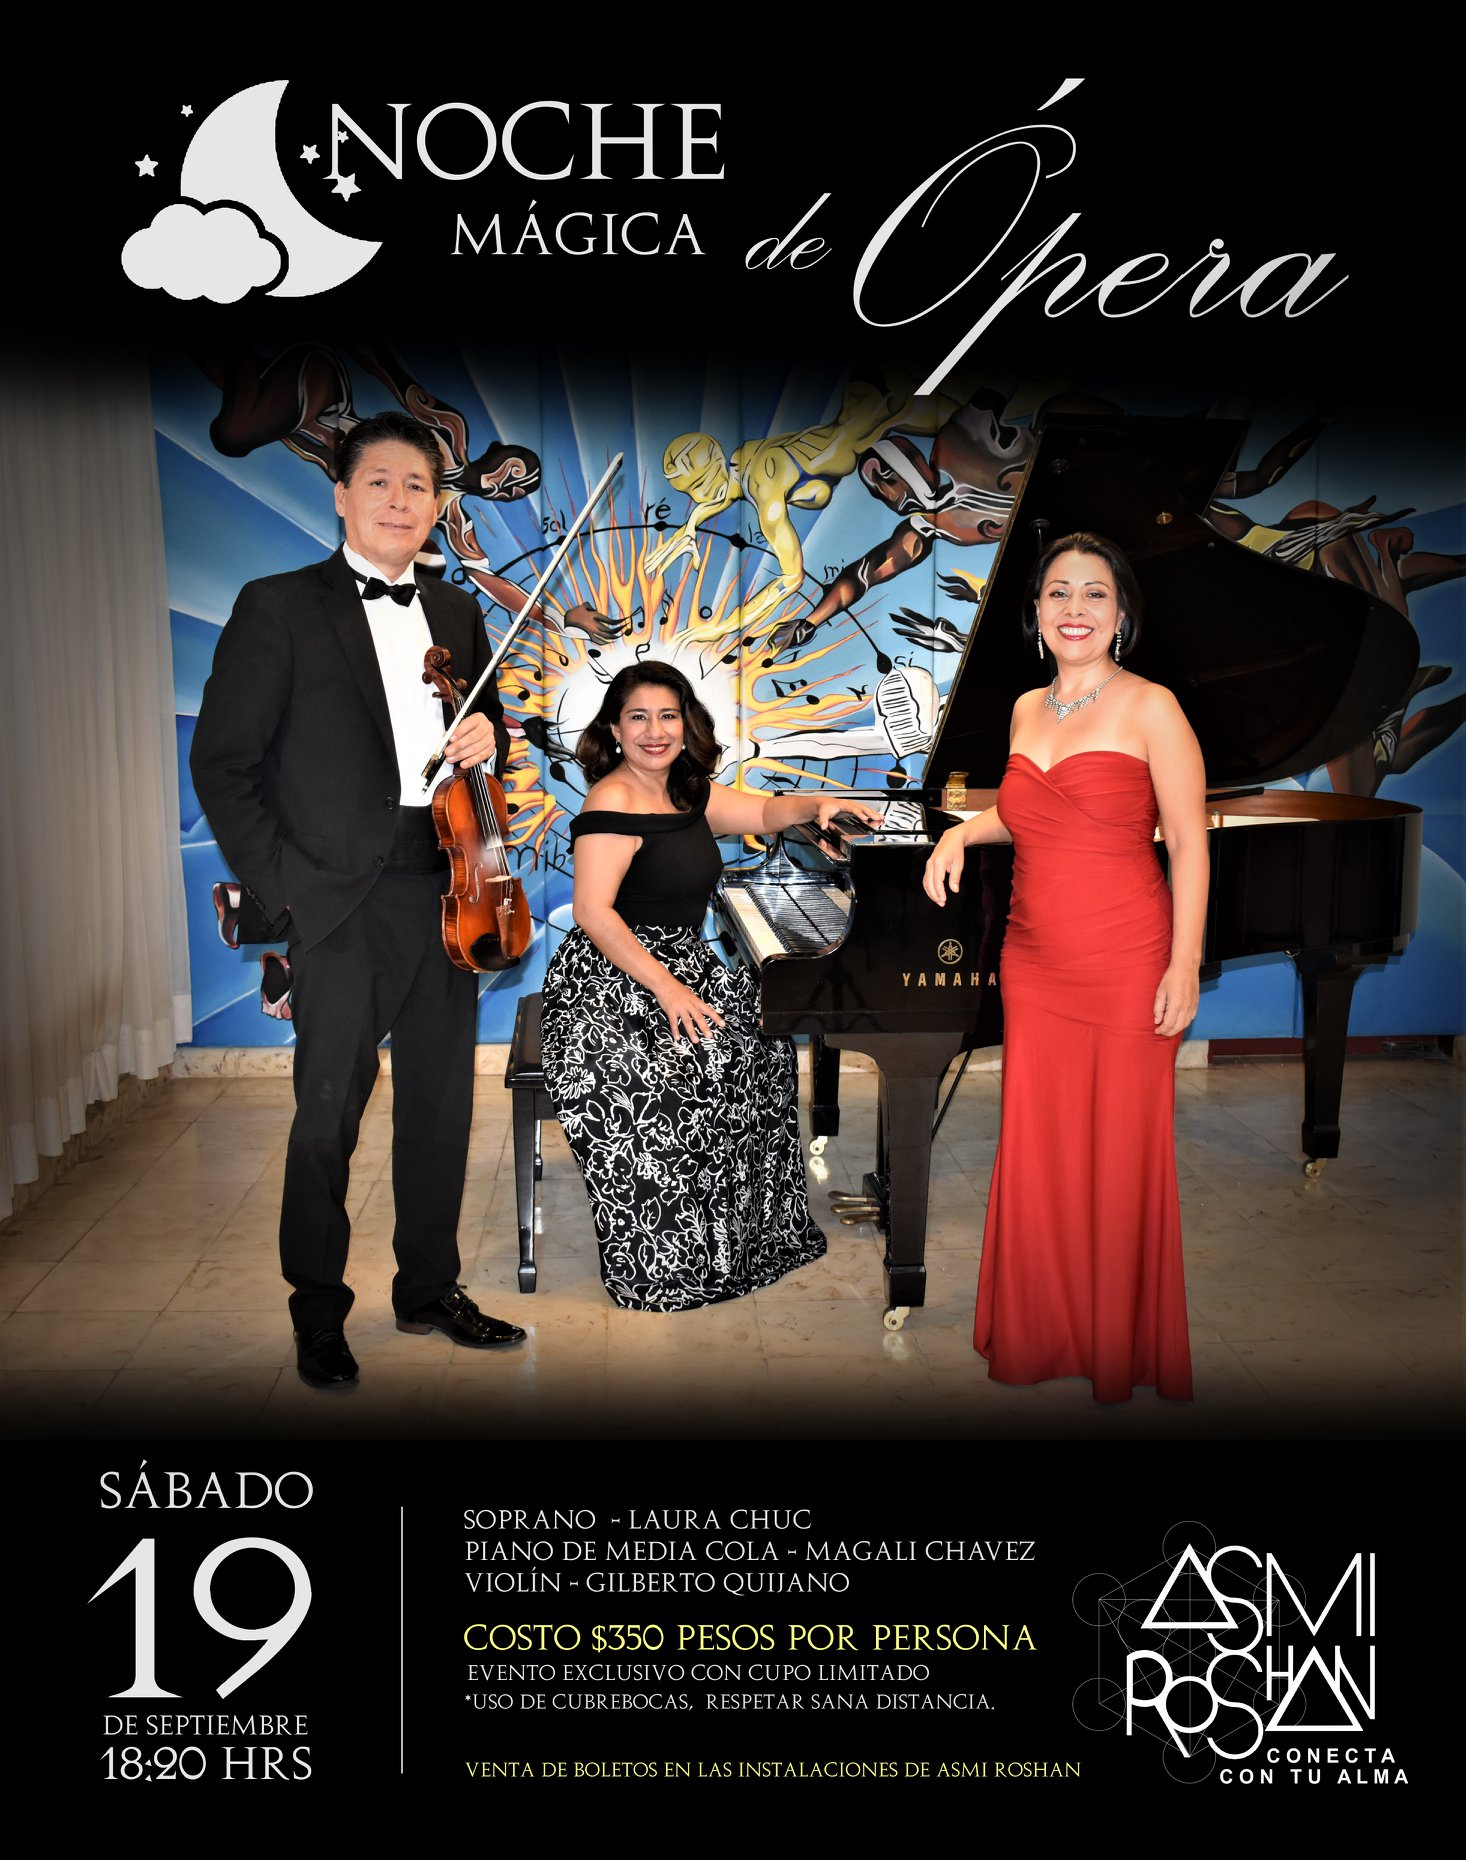 Noche Mágica de Opera